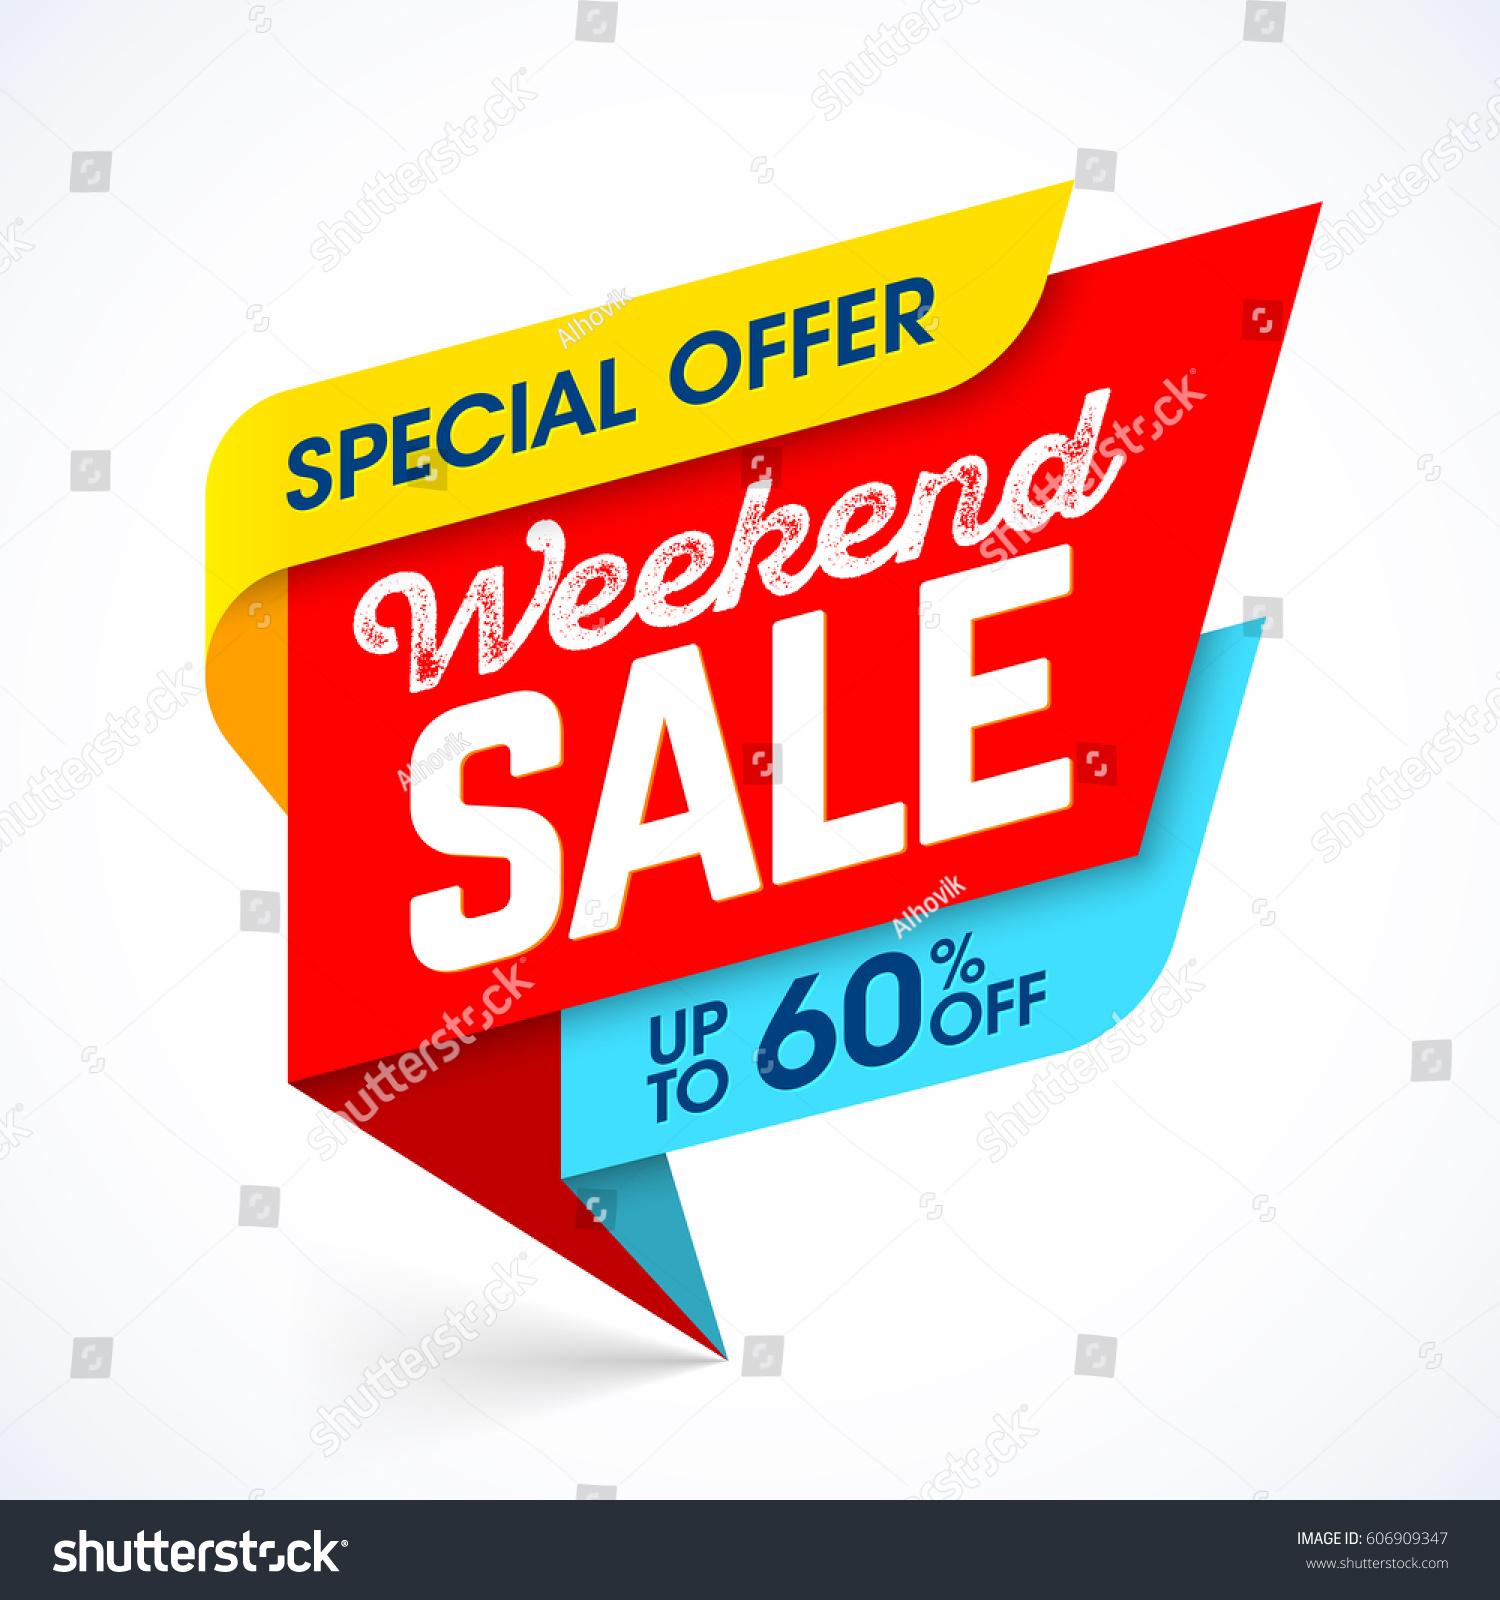 Ti9 Weekend Sale: Weekend Sale Special Offer Banner Vector Stock Vector